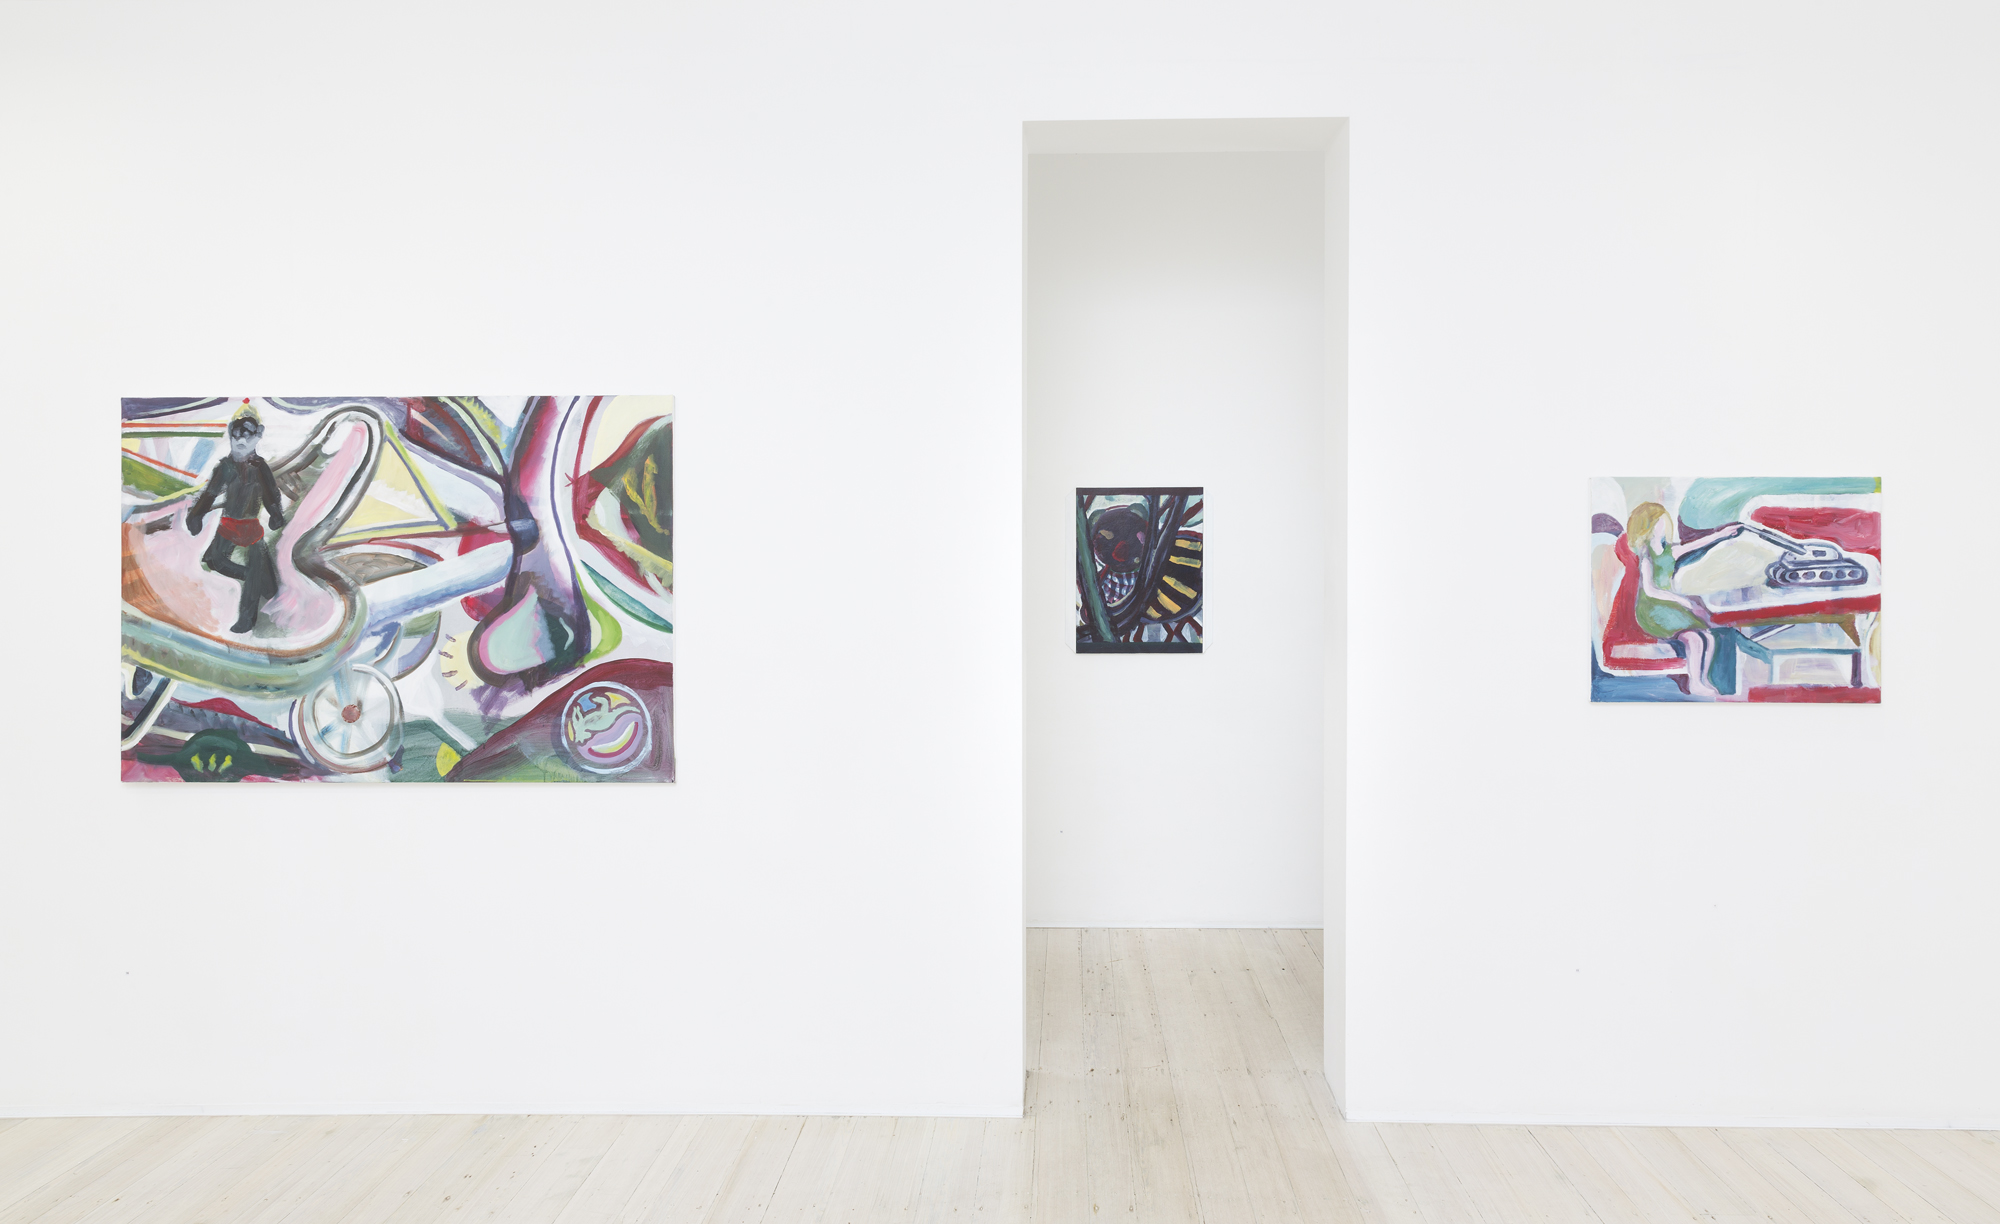 Gallery 9, Simon Blau, Artist, Exhibition